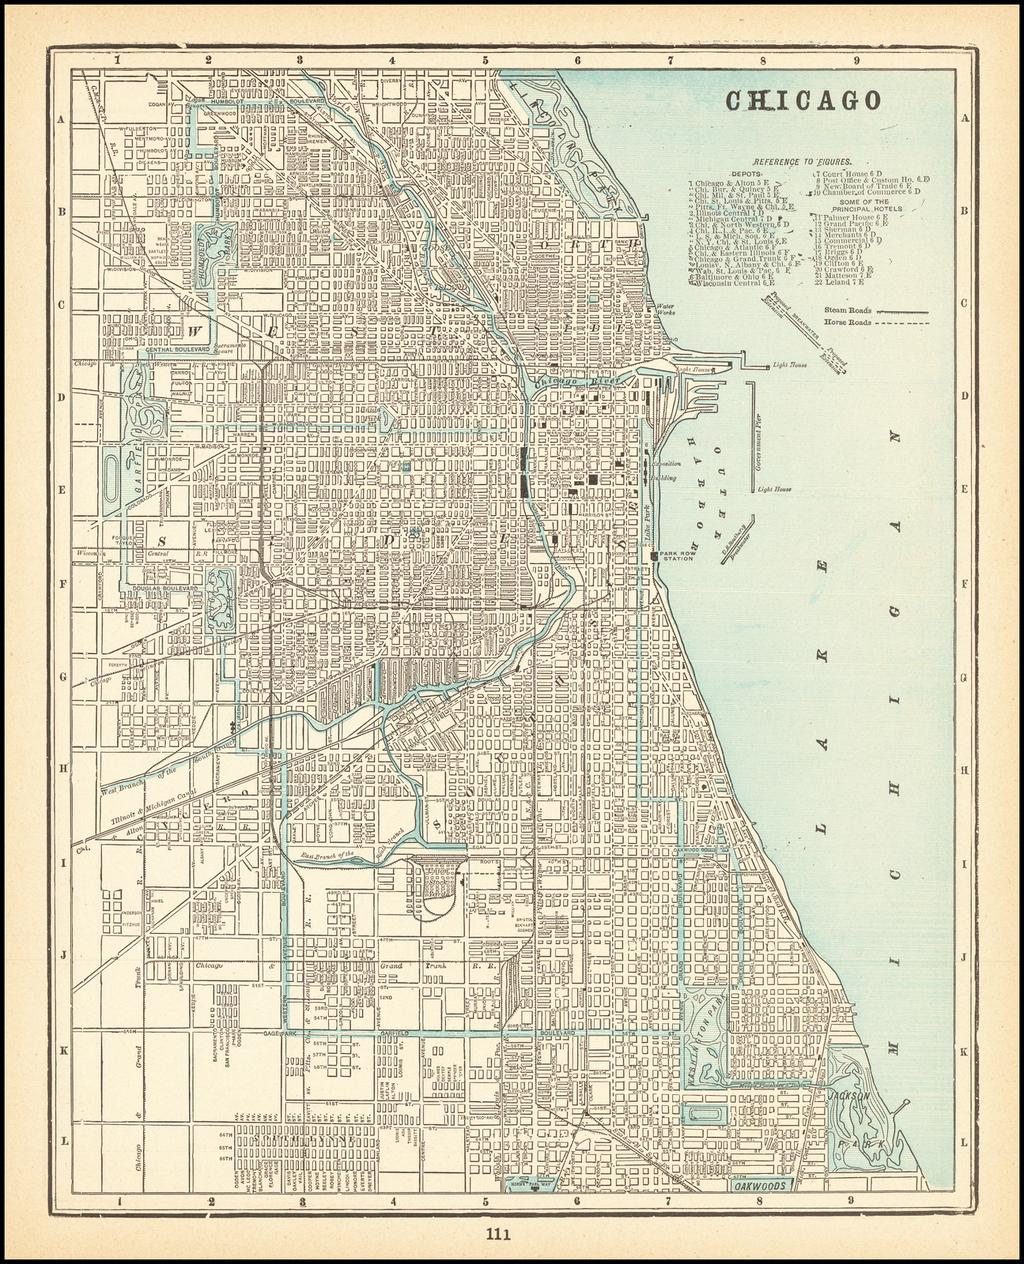 Chicago By George F. Cram